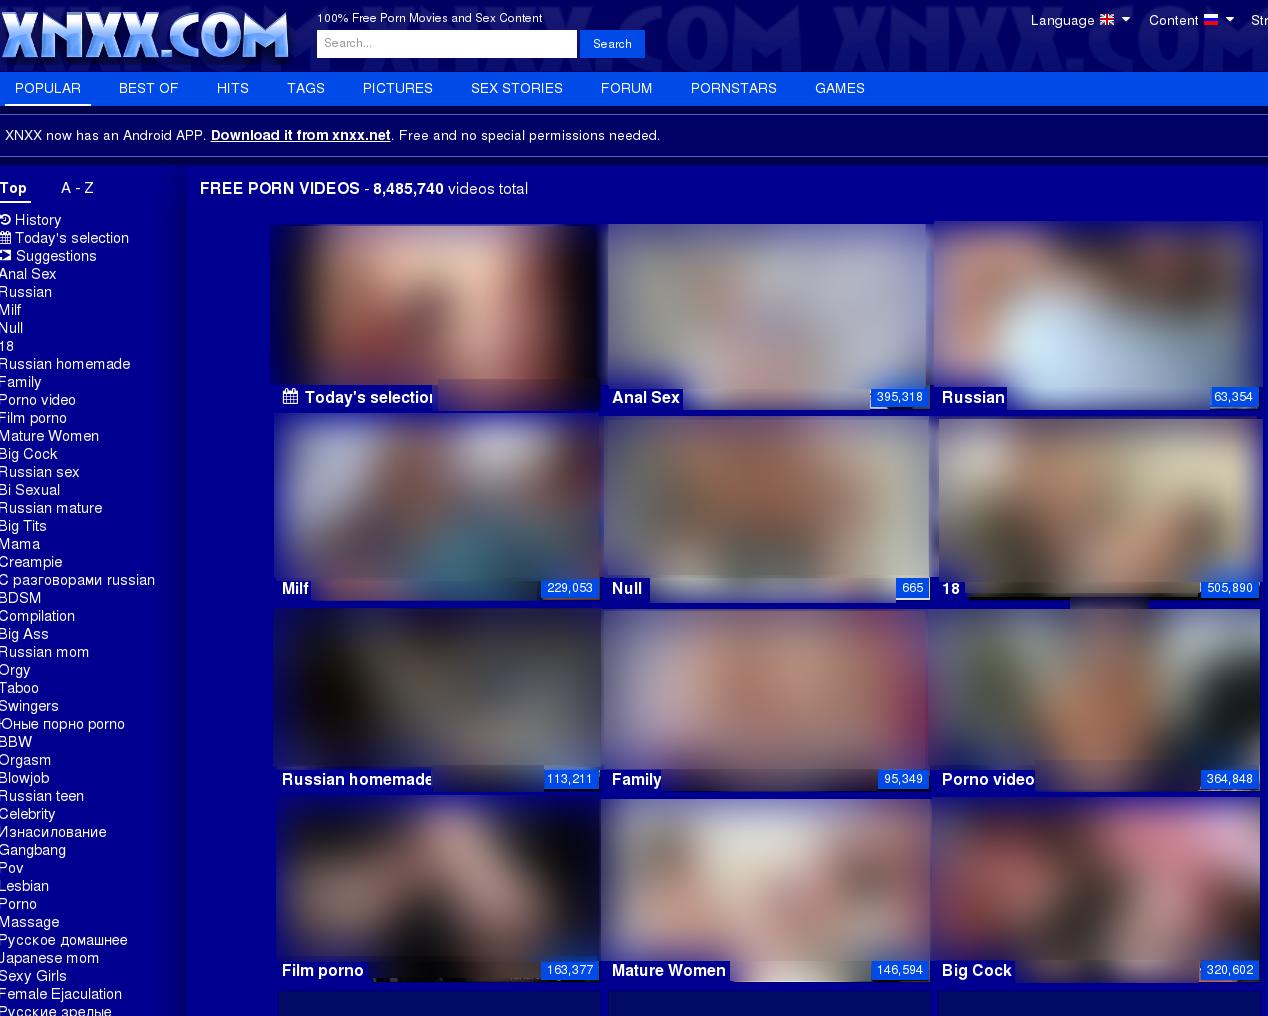 Sites trustworthy porn Best 10